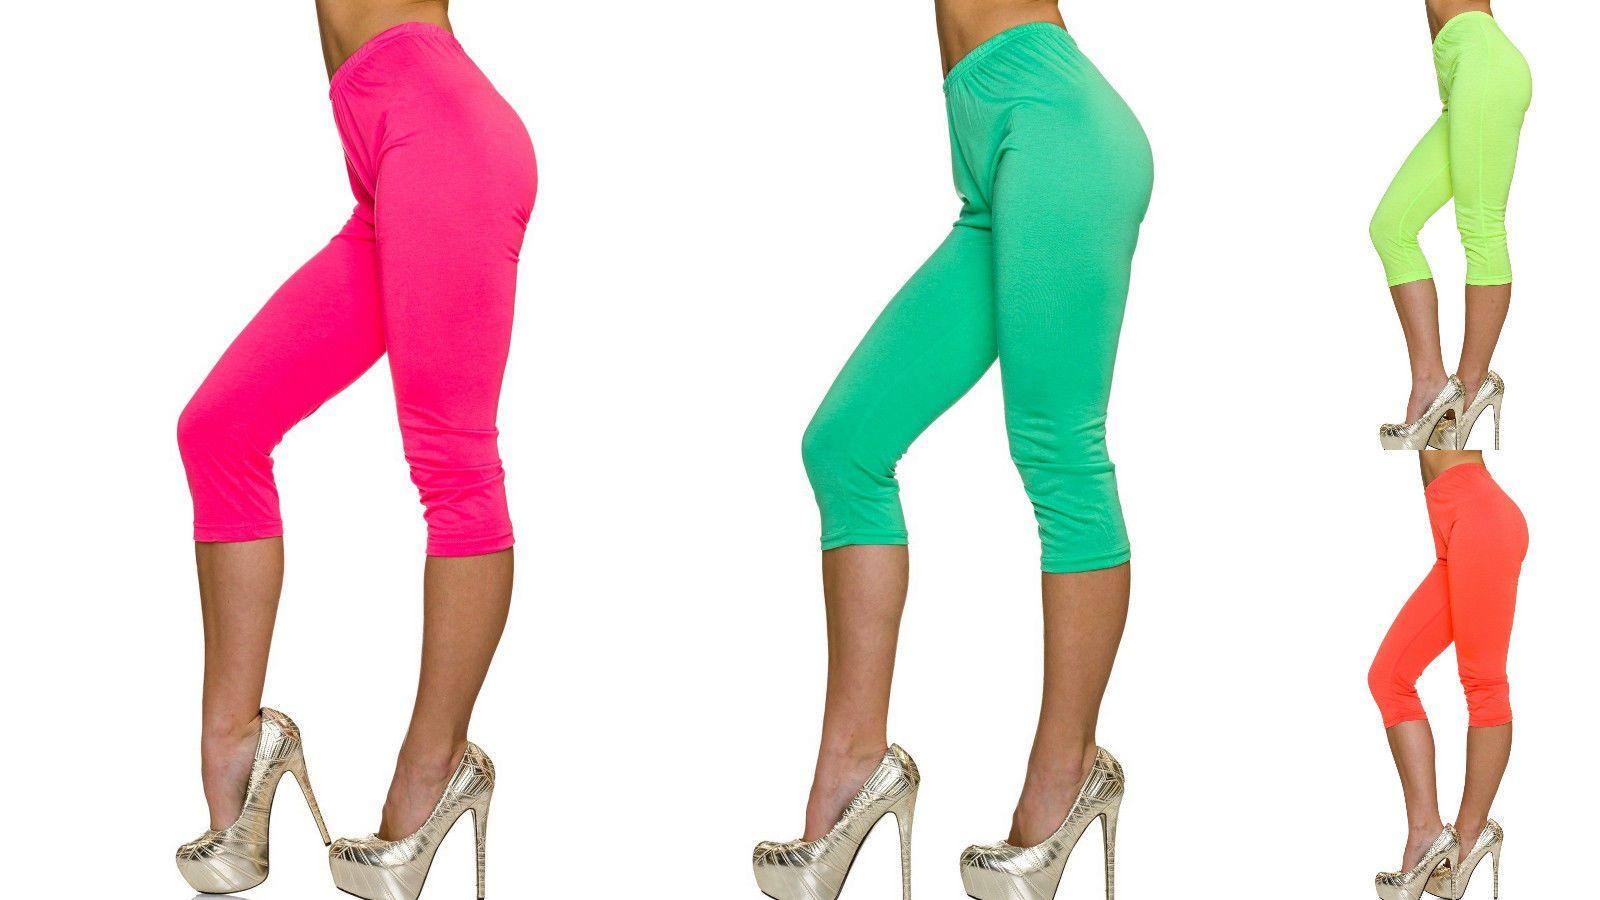 c696b8c676dccd Womens 3/4 Length Leggings Ladies Floral Lace Cropped Trim Edge Jeggings  Pants | eBay